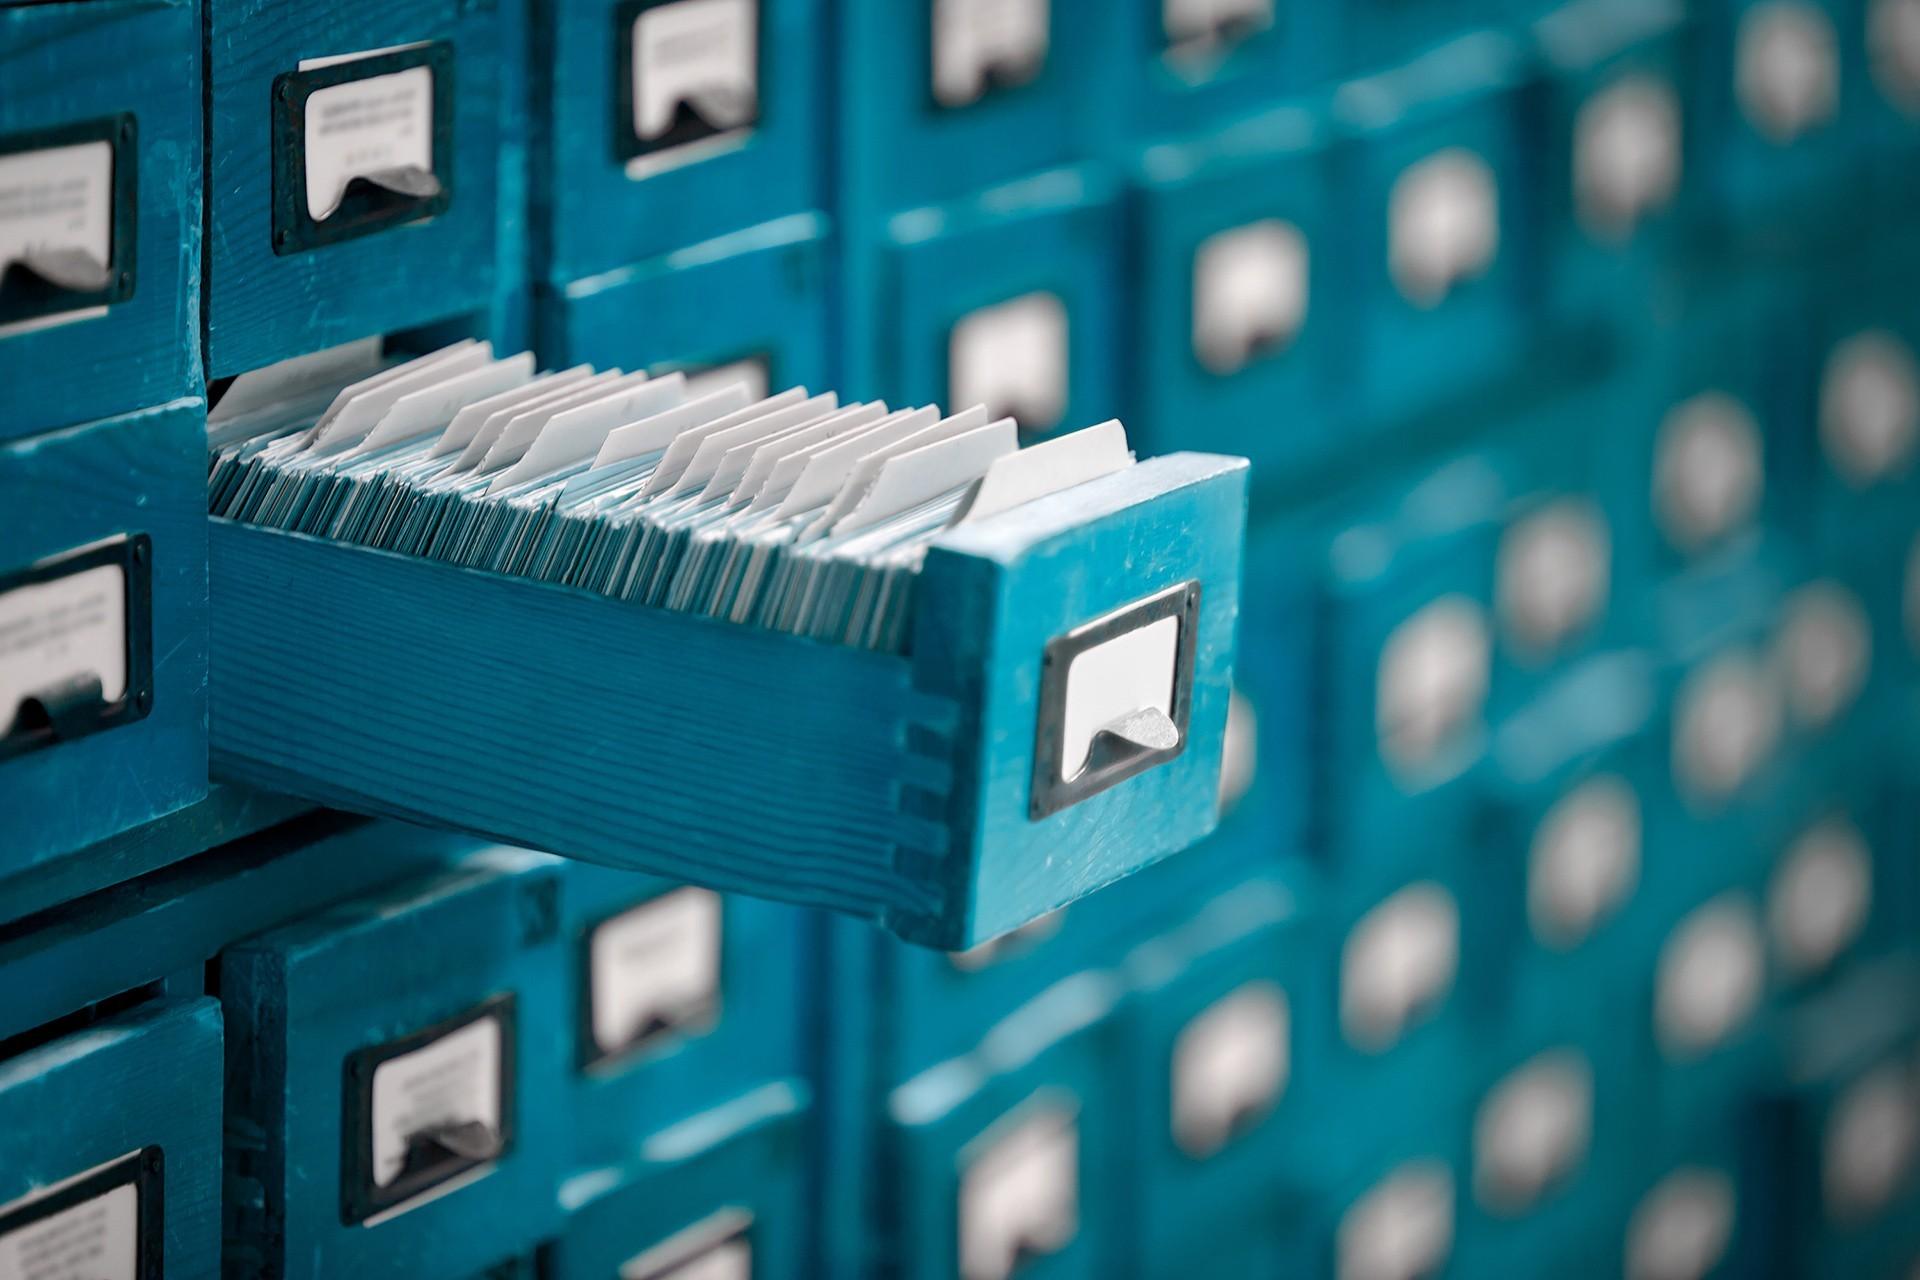 Archivlösung implementieren